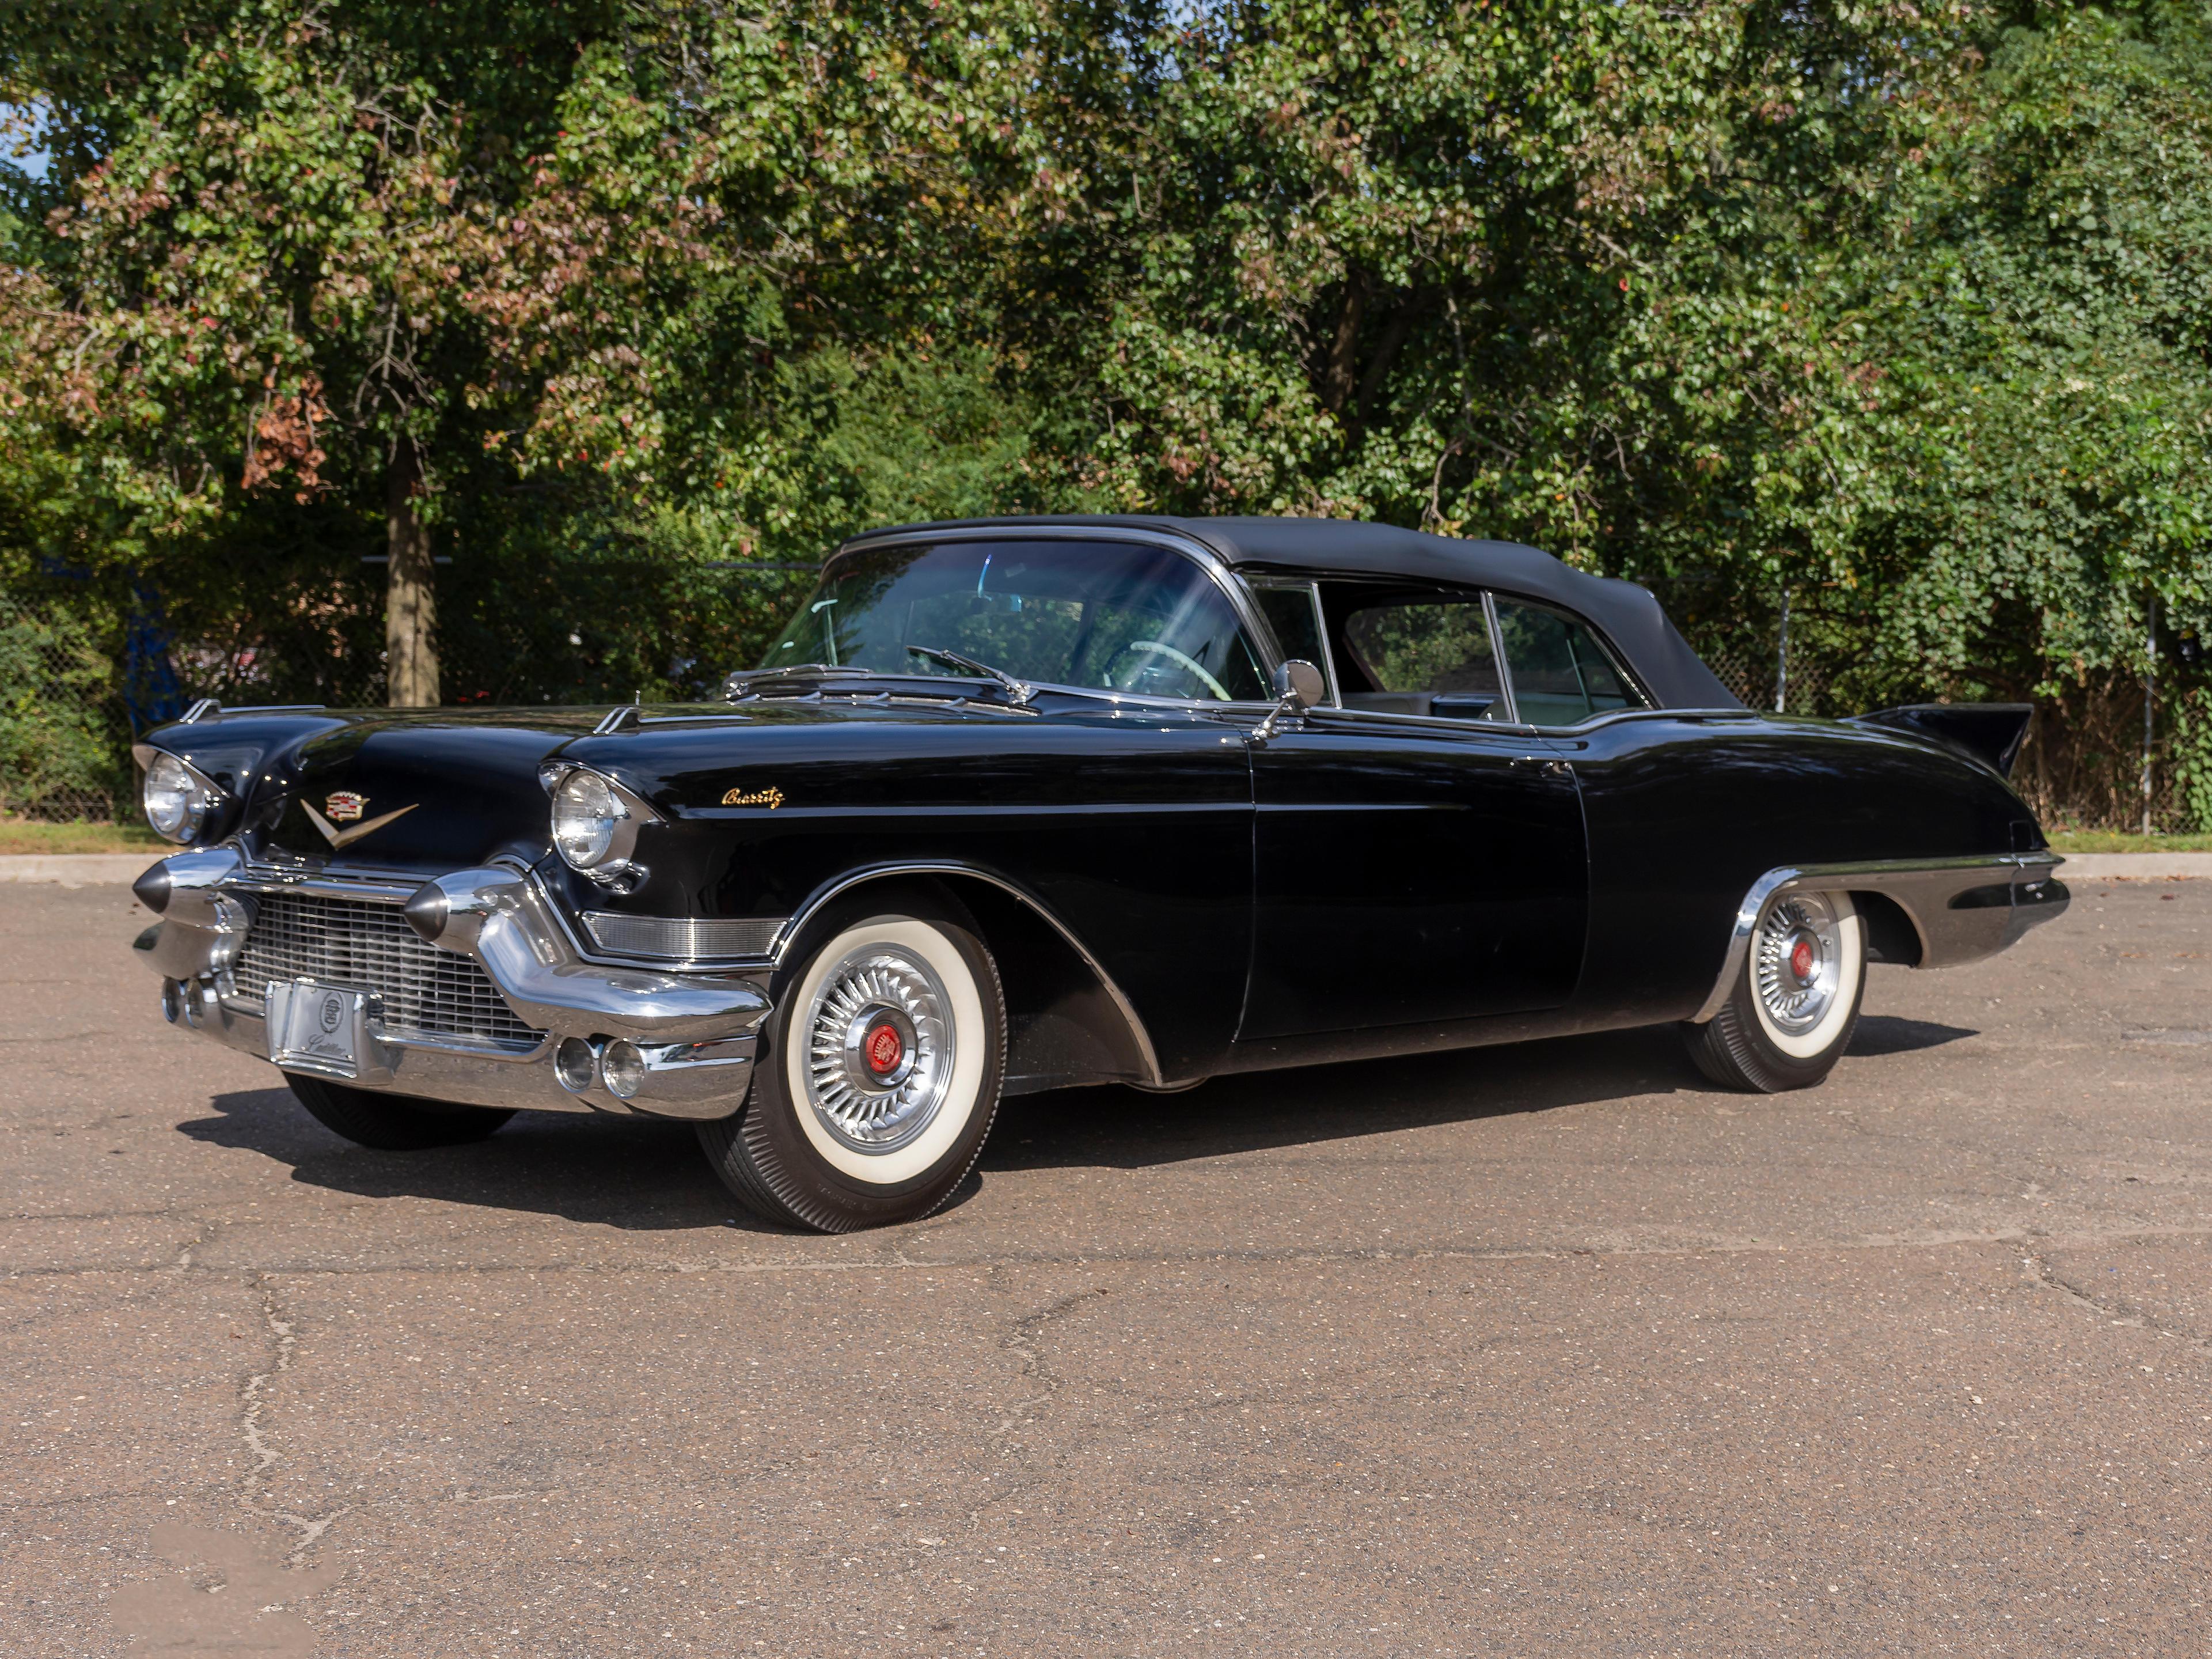 1957 Cadillac Eldorado Biarritz Convertible   Chassis no. 5762066646